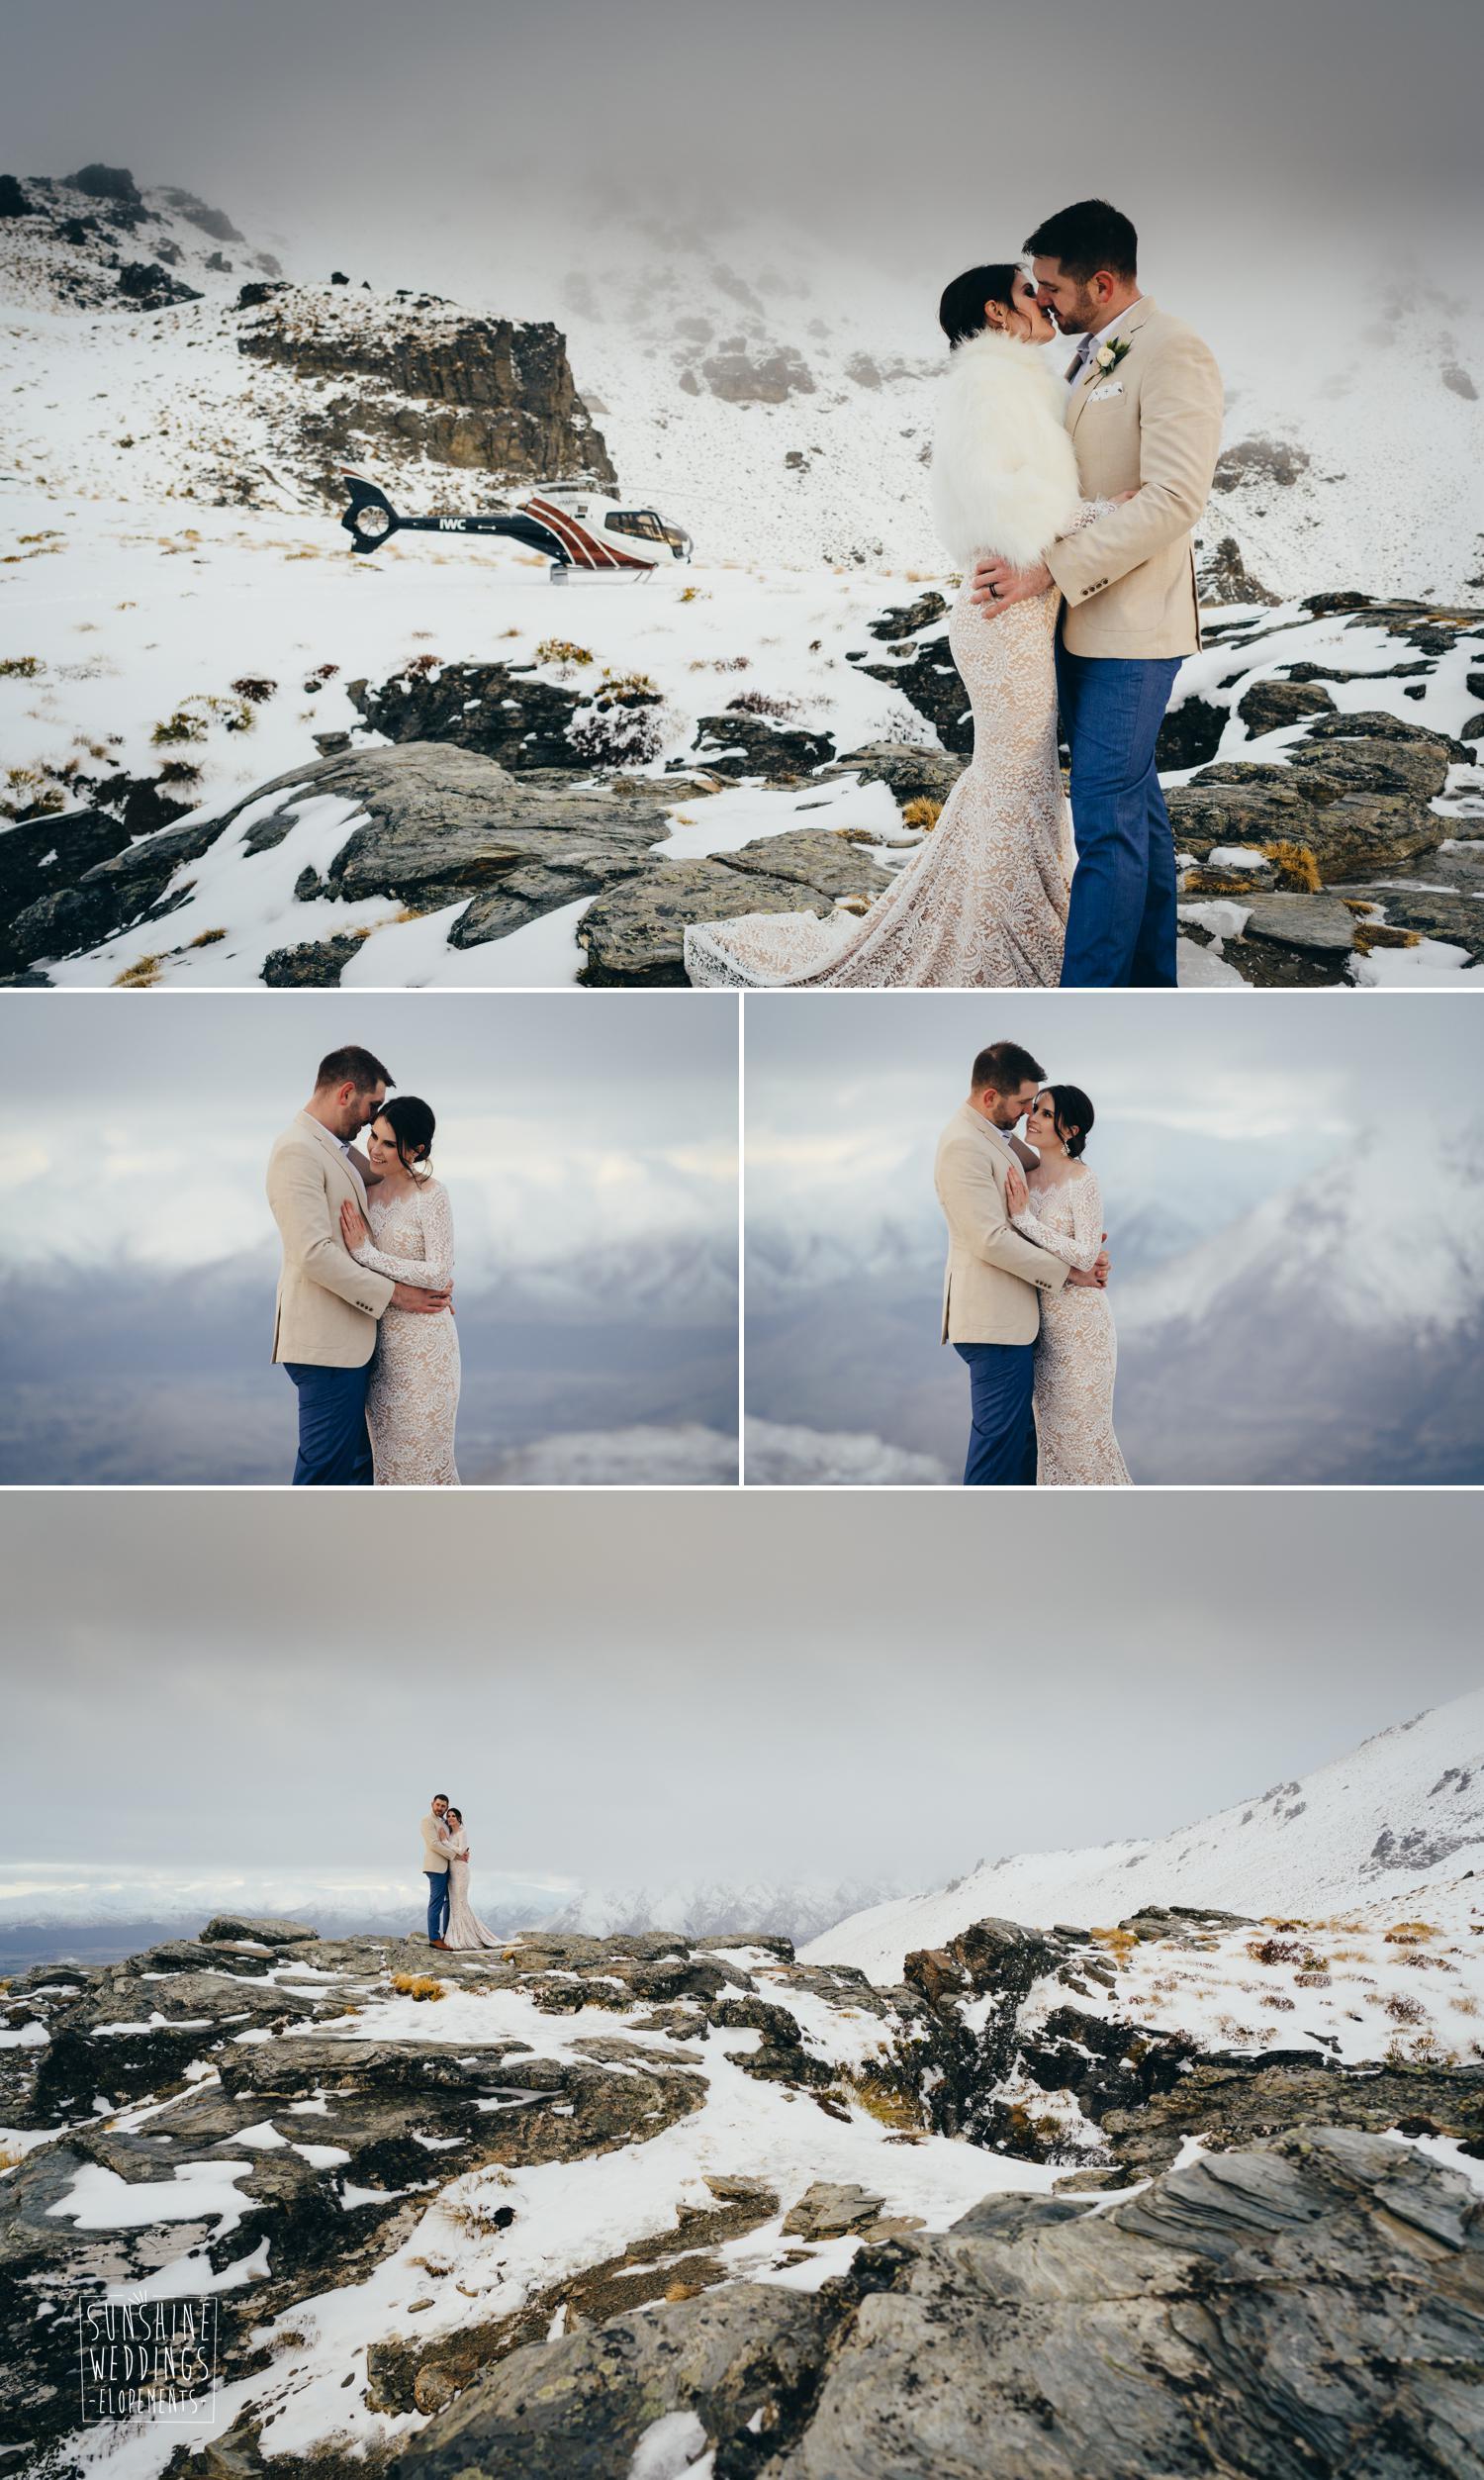 Winter wedding planner New Zealand